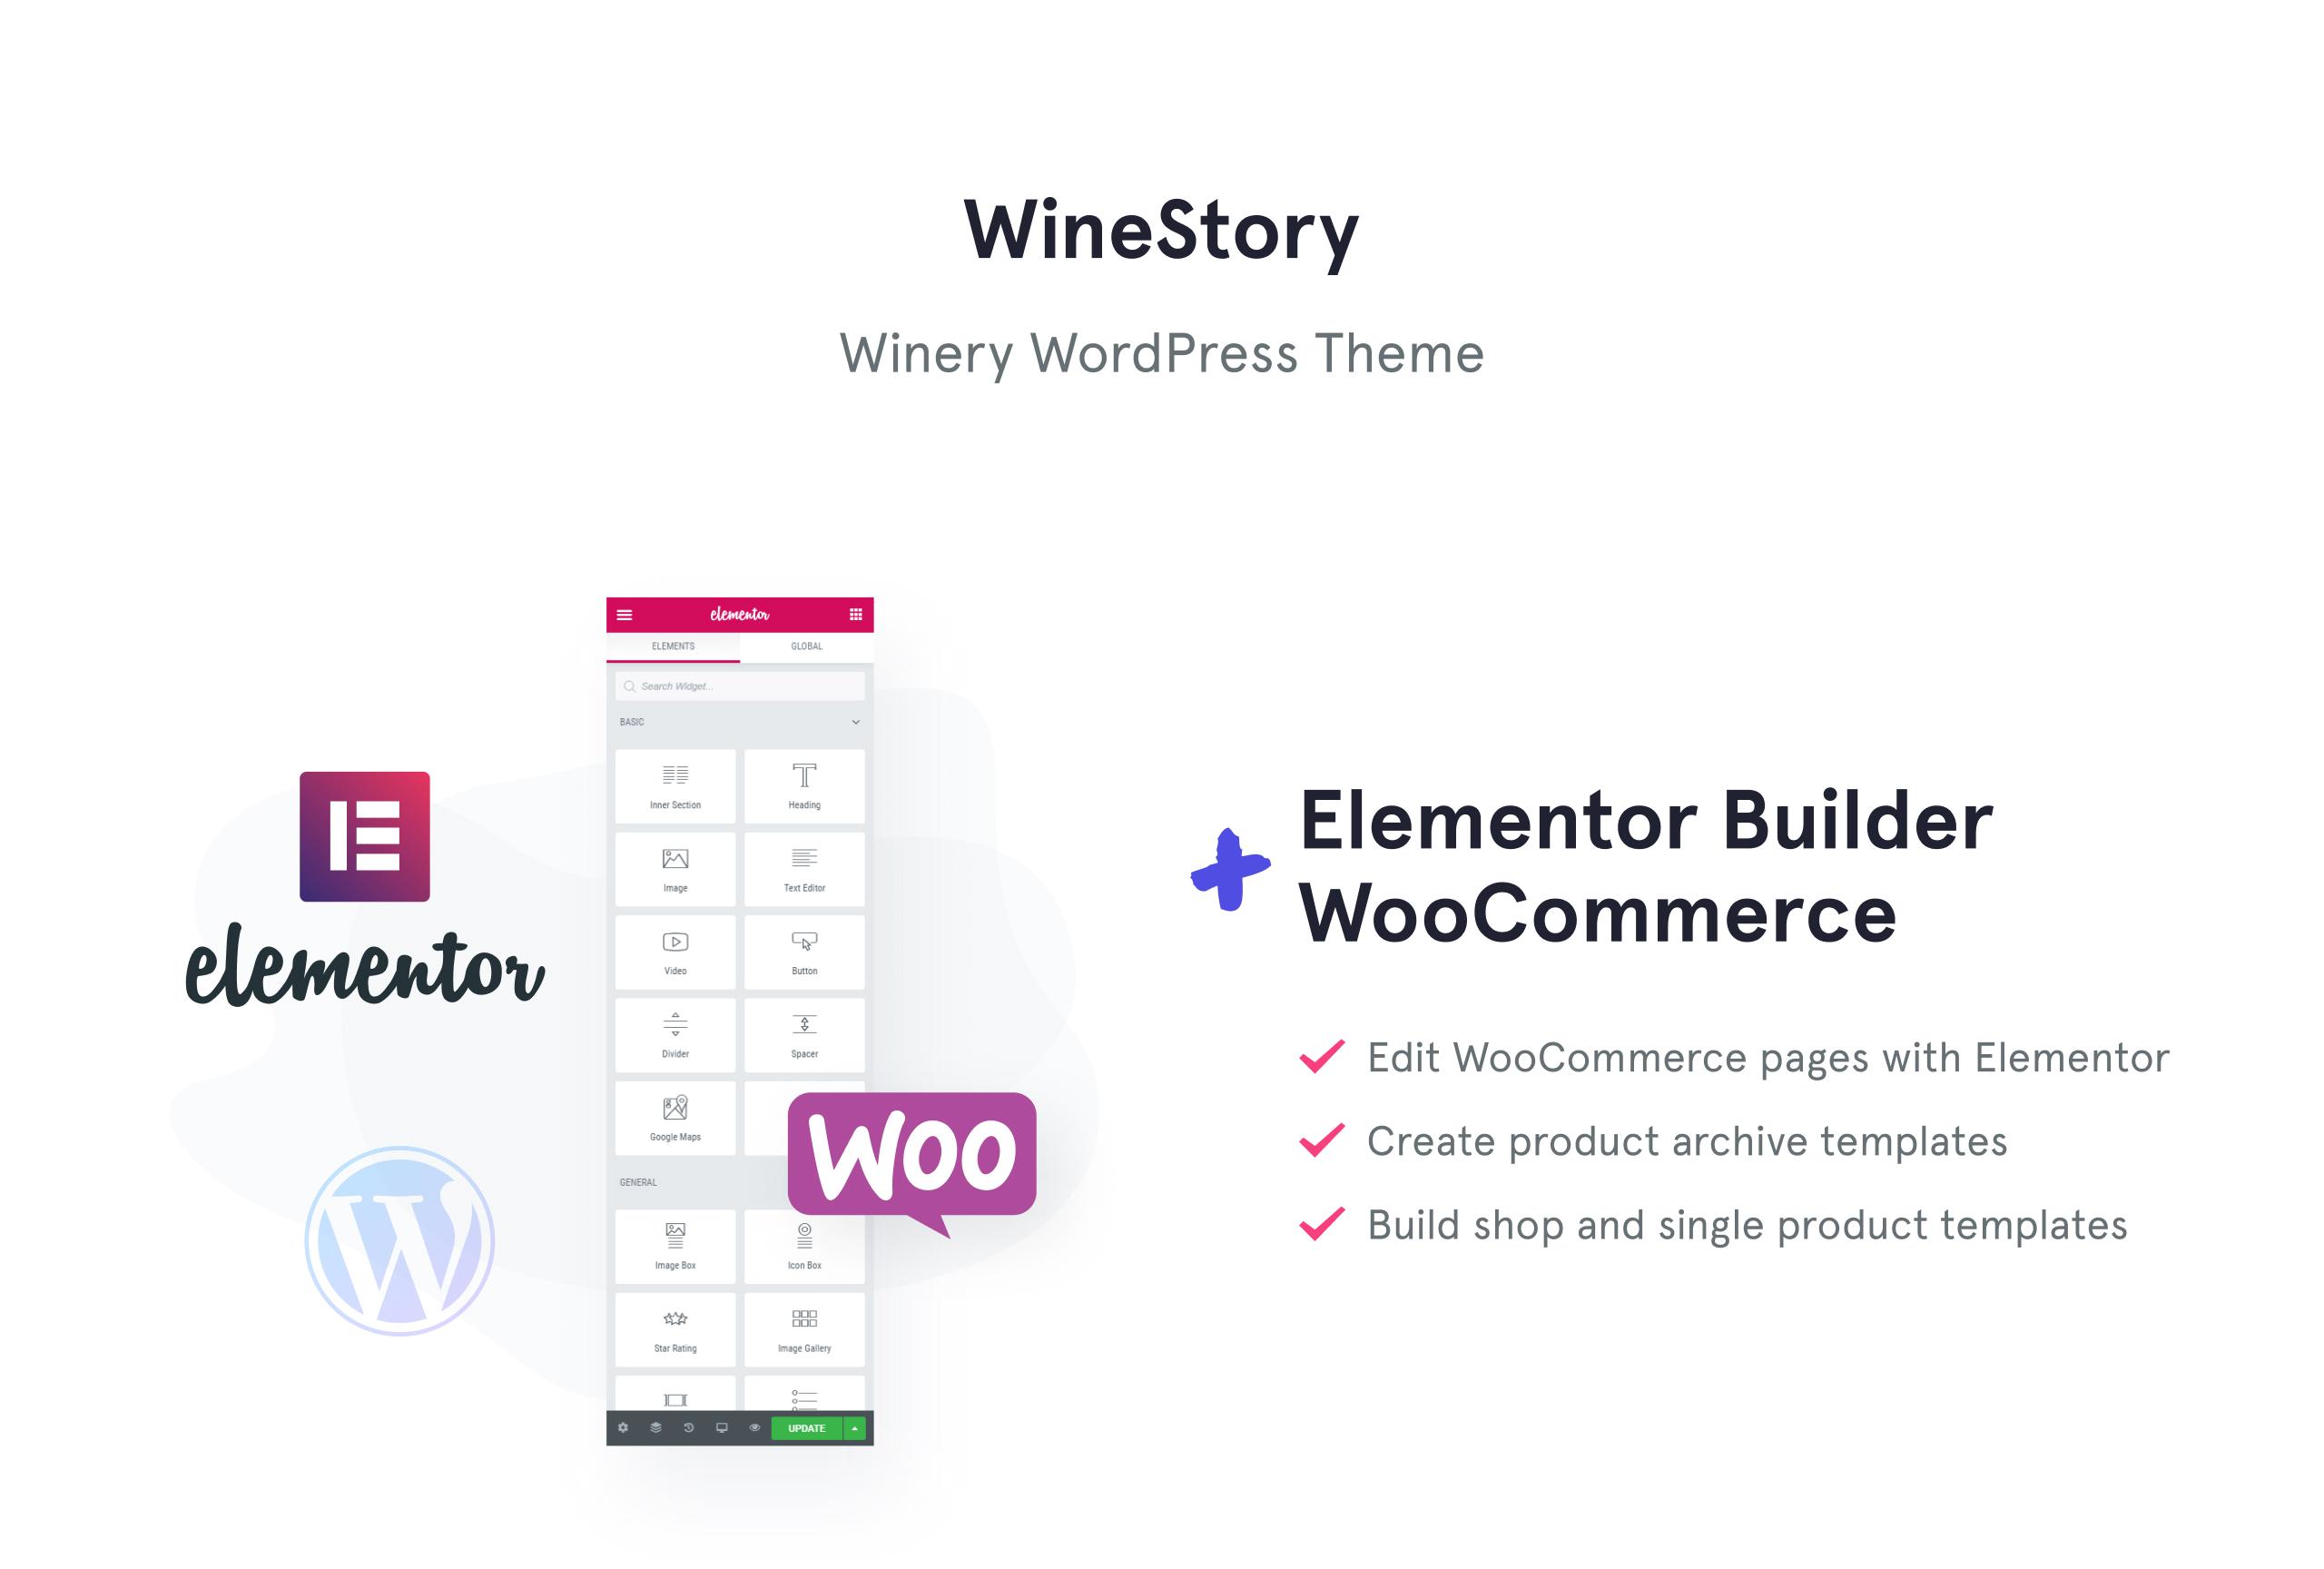 WineStory - Genuine And Charming Winery WooCommerce Theme